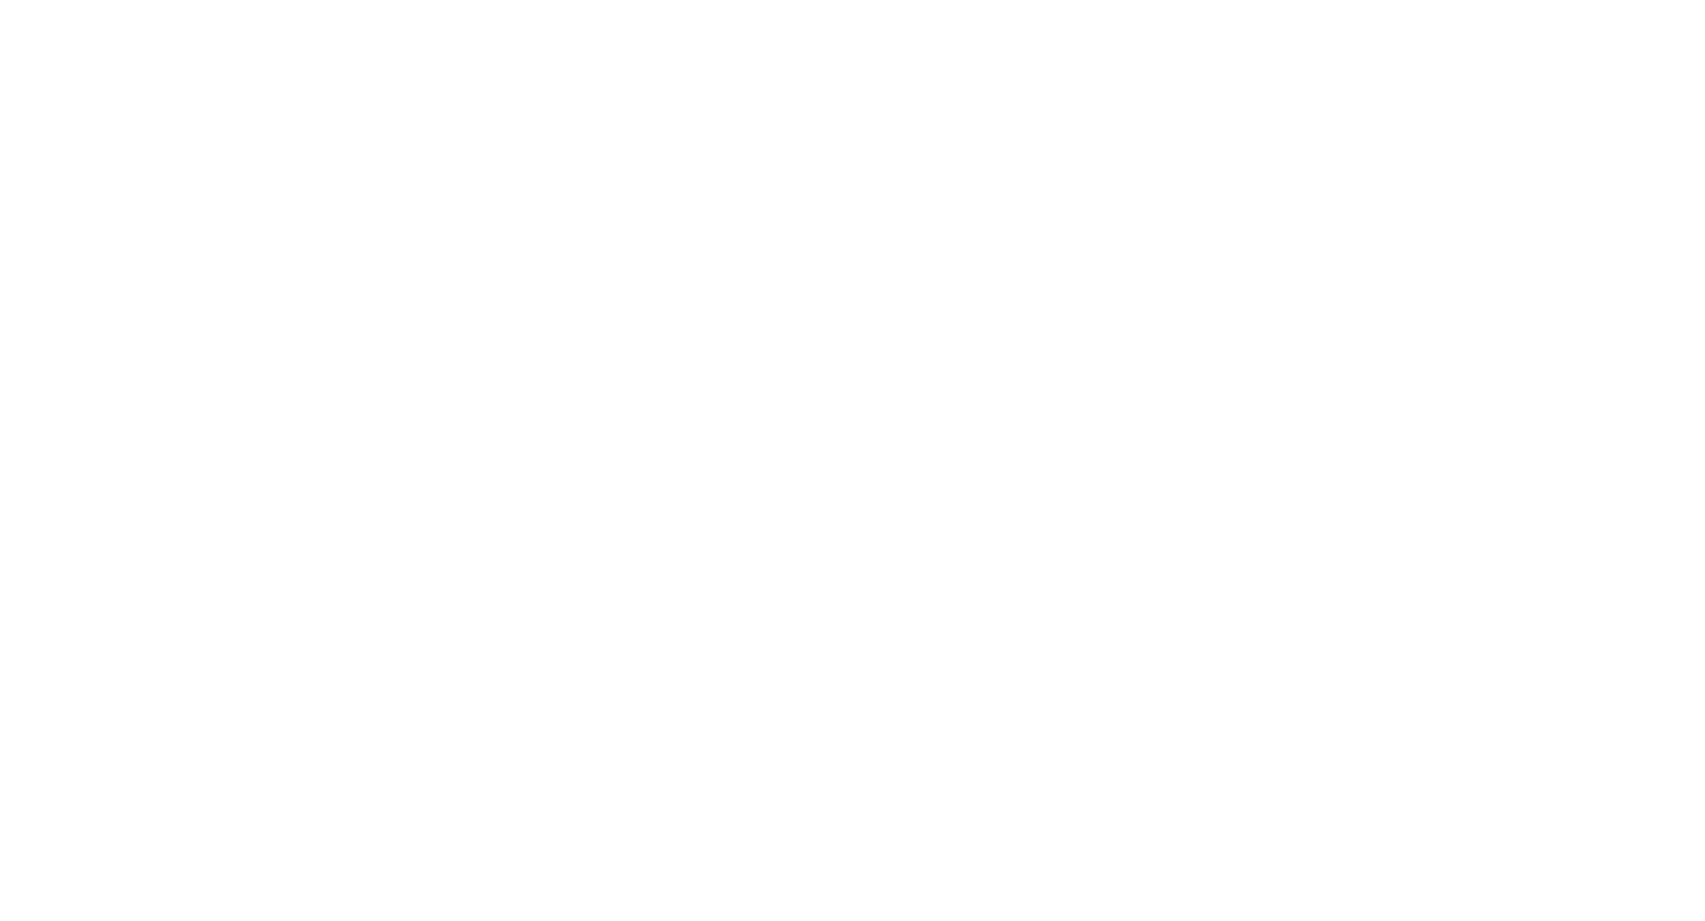 Happy Hobby Scrap